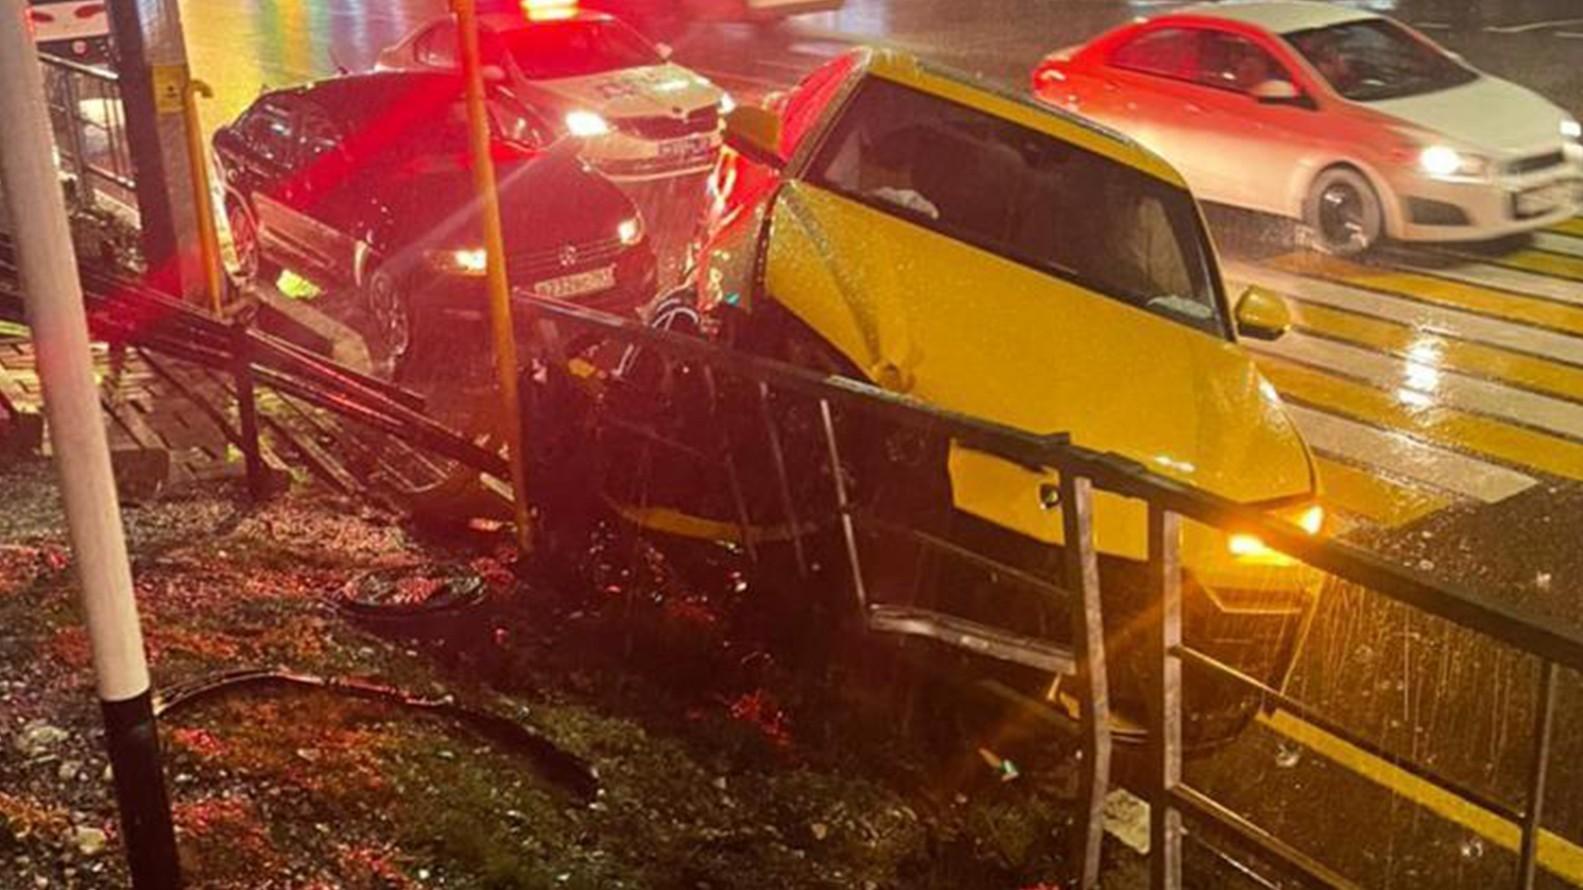 Видео: молодой лихач разбил под Сочи Lamborghini знакомой Моргенштерна